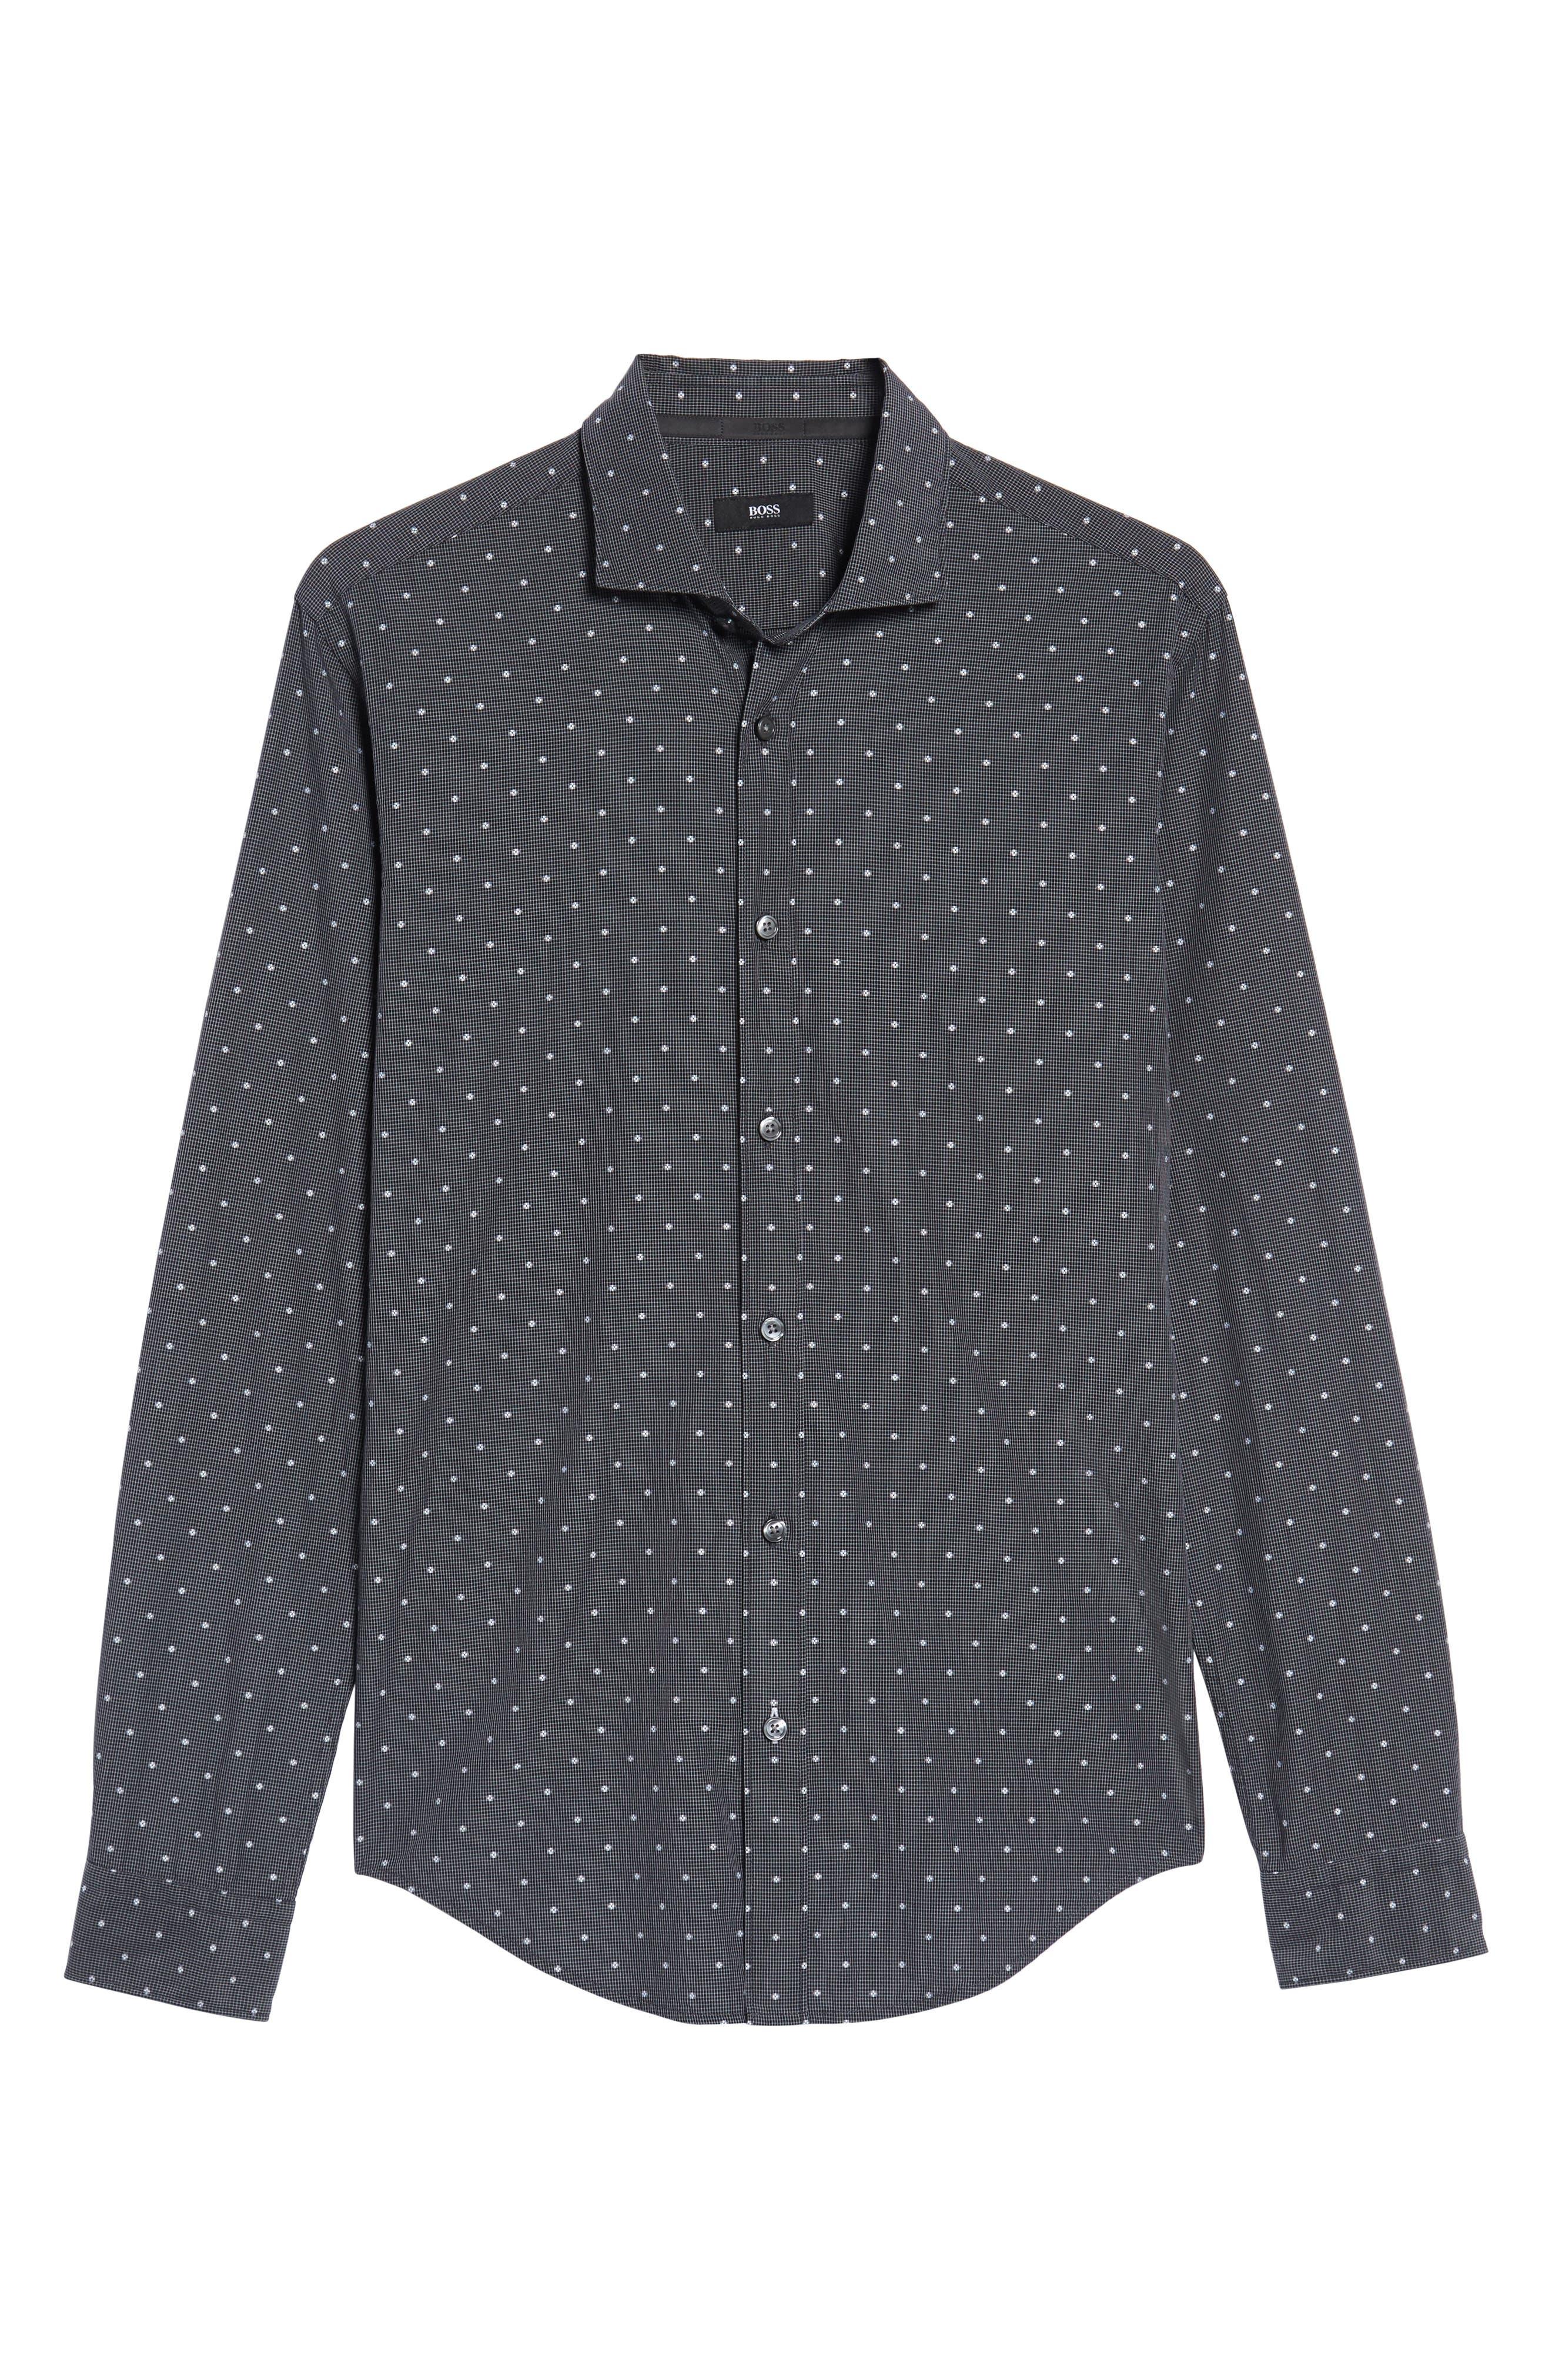 Ridley Slim Fit Dot Sport Shirt,                             Alternate thumbnail 6, color,                             Black